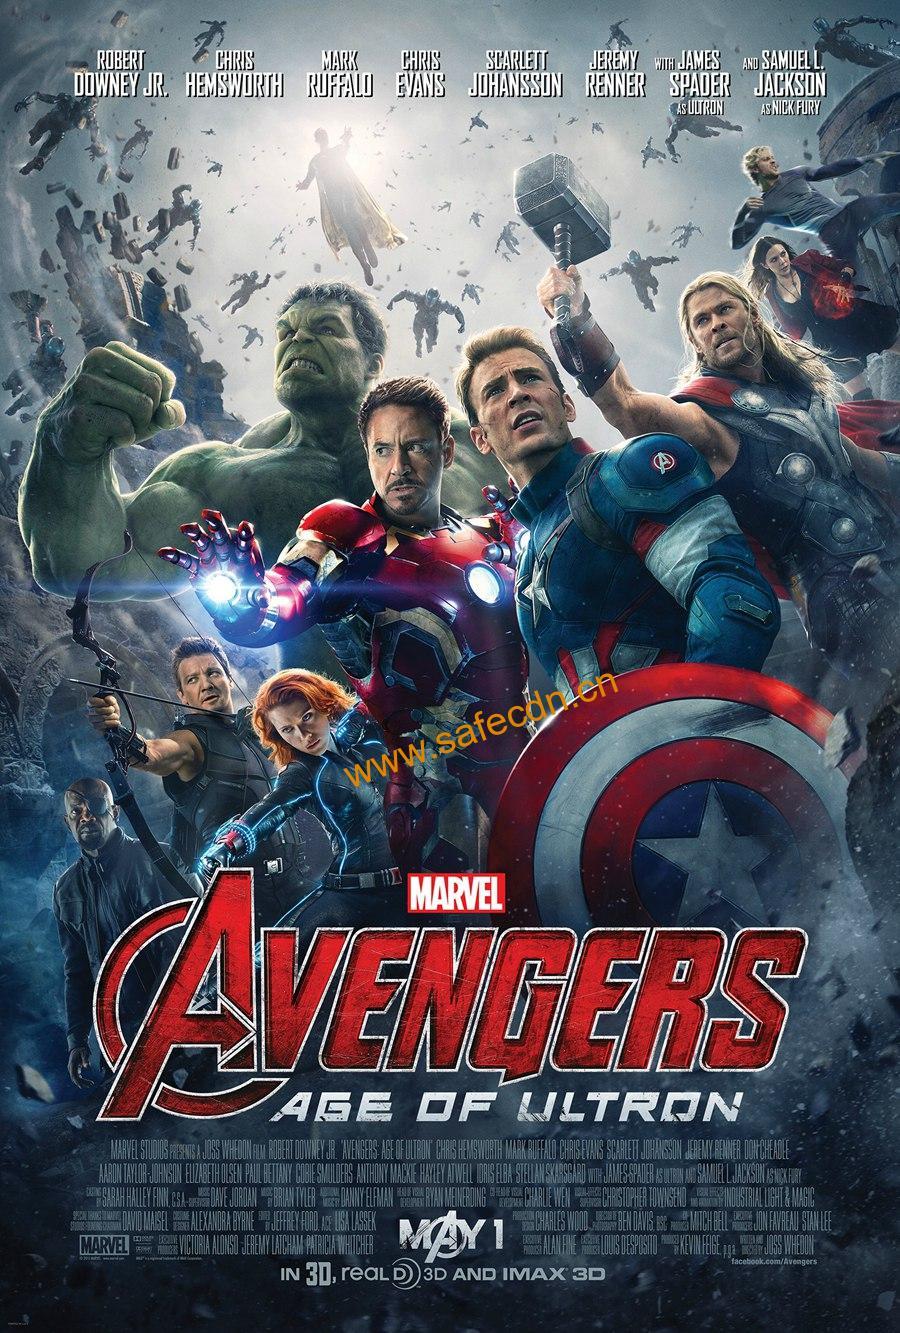 复仇者联盟2:奥创纪元 蓝光原盘下载+高清MKV版/ 复仇者联盟:奥创时代 / 复仇者联盟:奥创年代 / 复联2 /2015 Marvel Avengers: Age of Ultron 41.68G